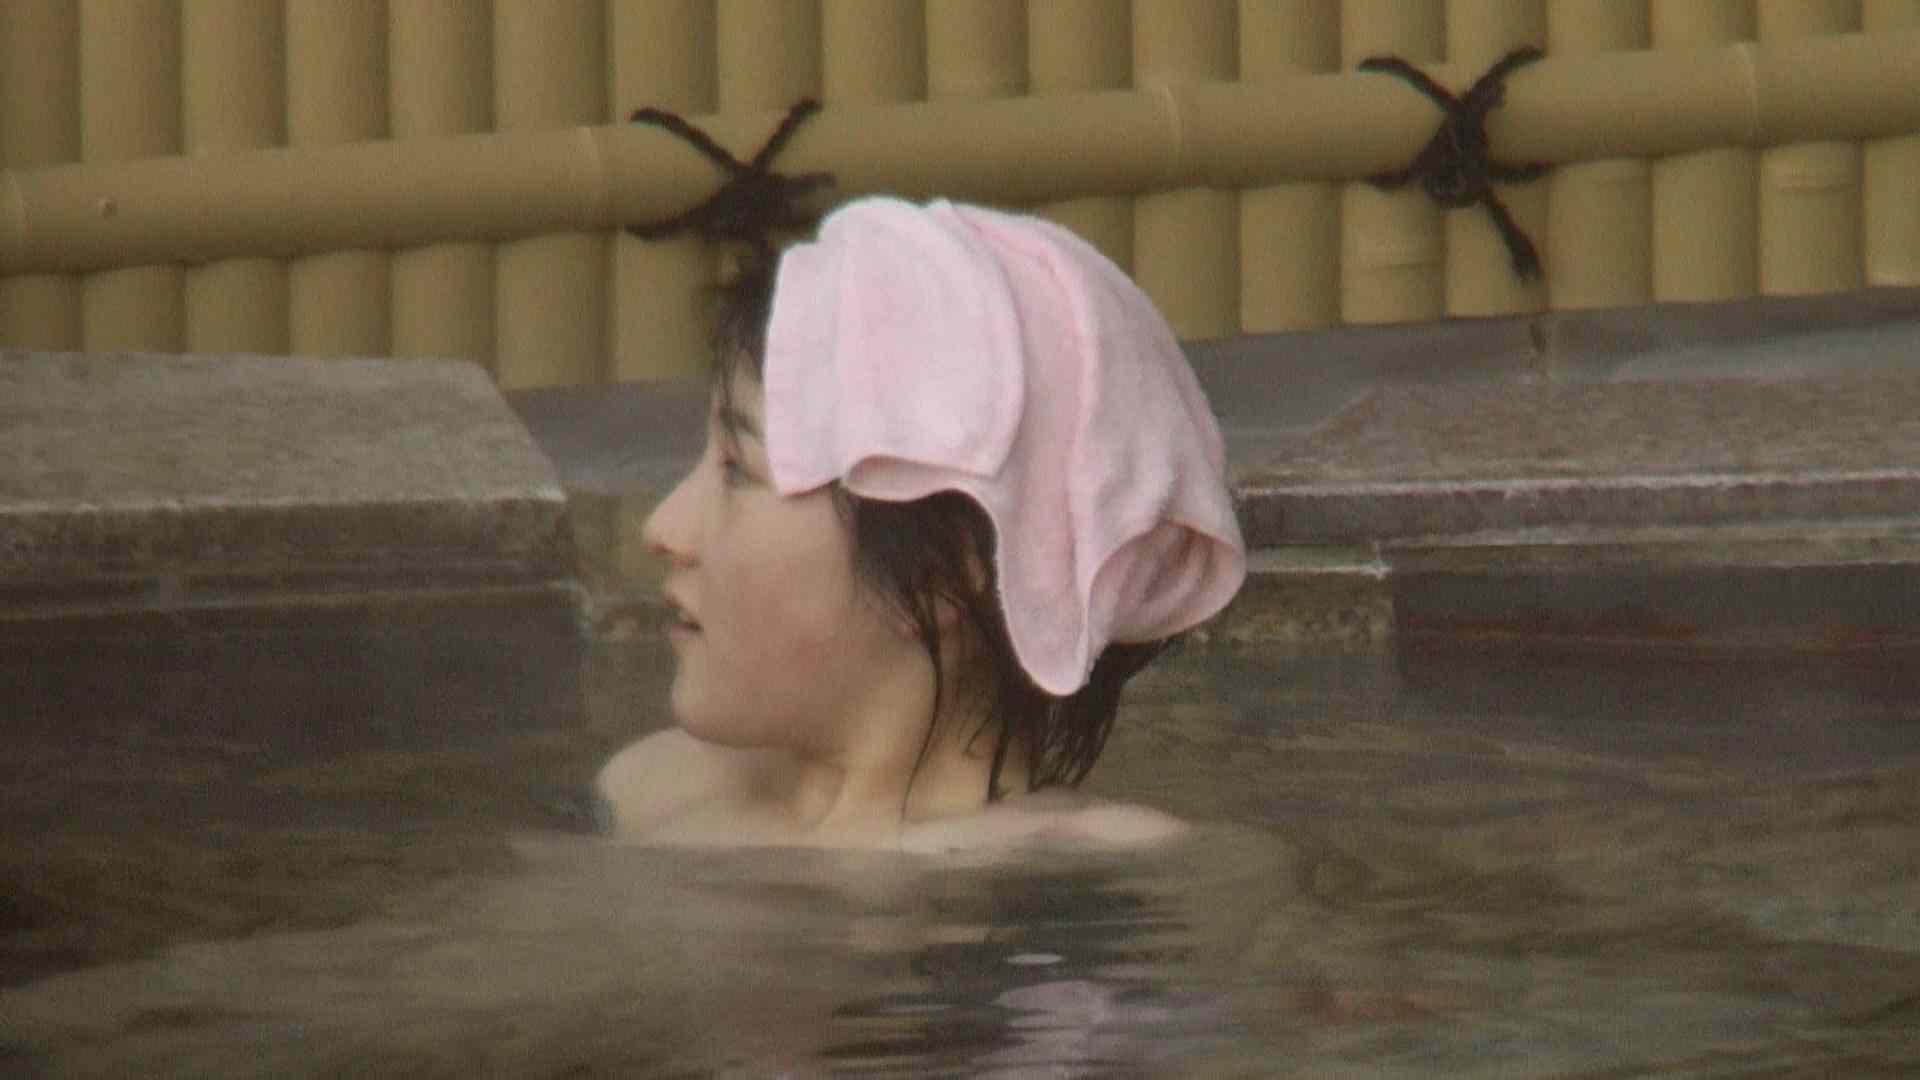 Aquaな露天風呂Vol.207 OLのエロ生活 | 露天風呂  98連発 67